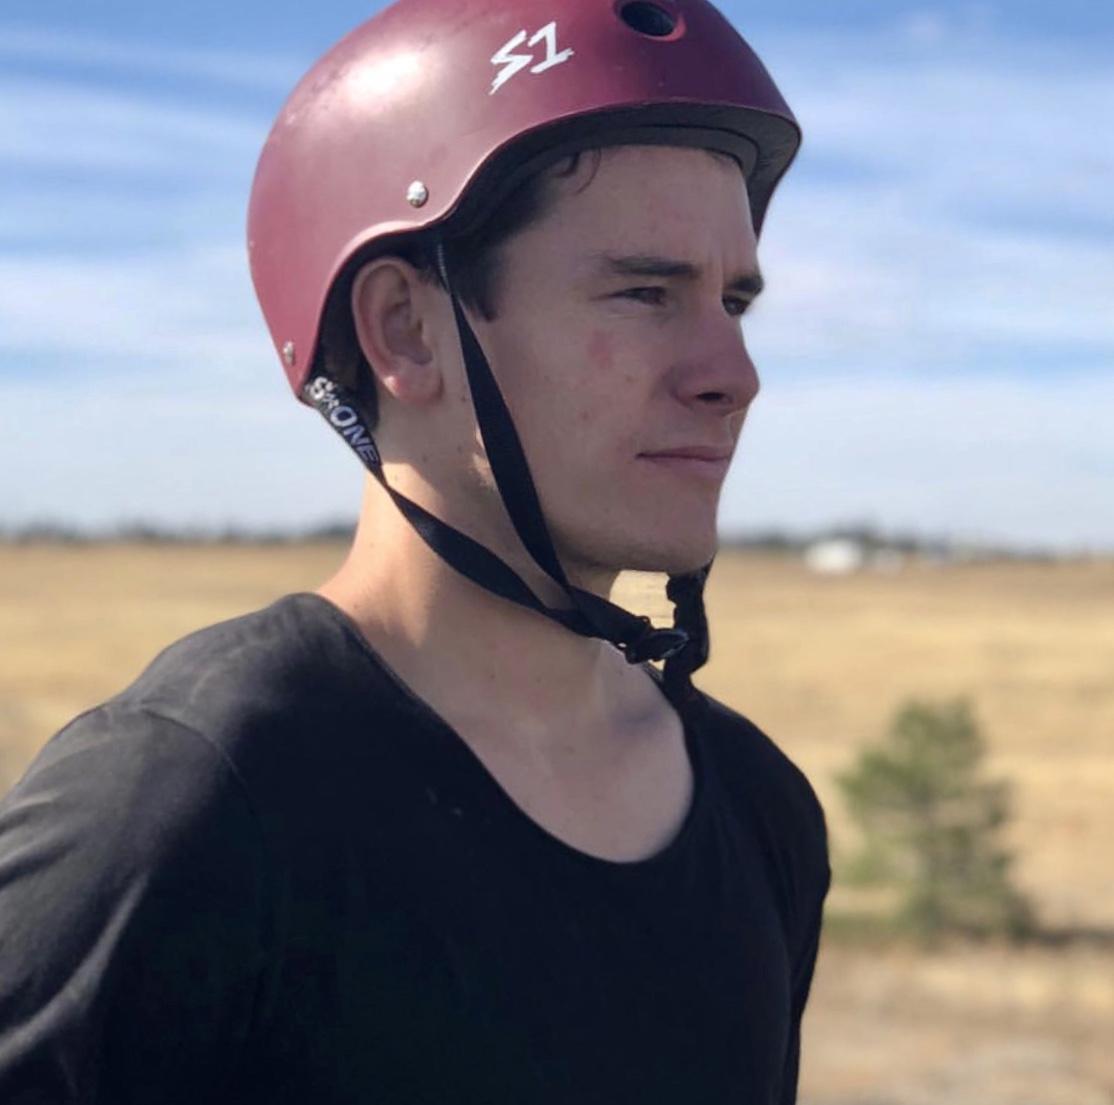 PRO Rider: Chris Farris  The Scooter Farm  @chris.farris12